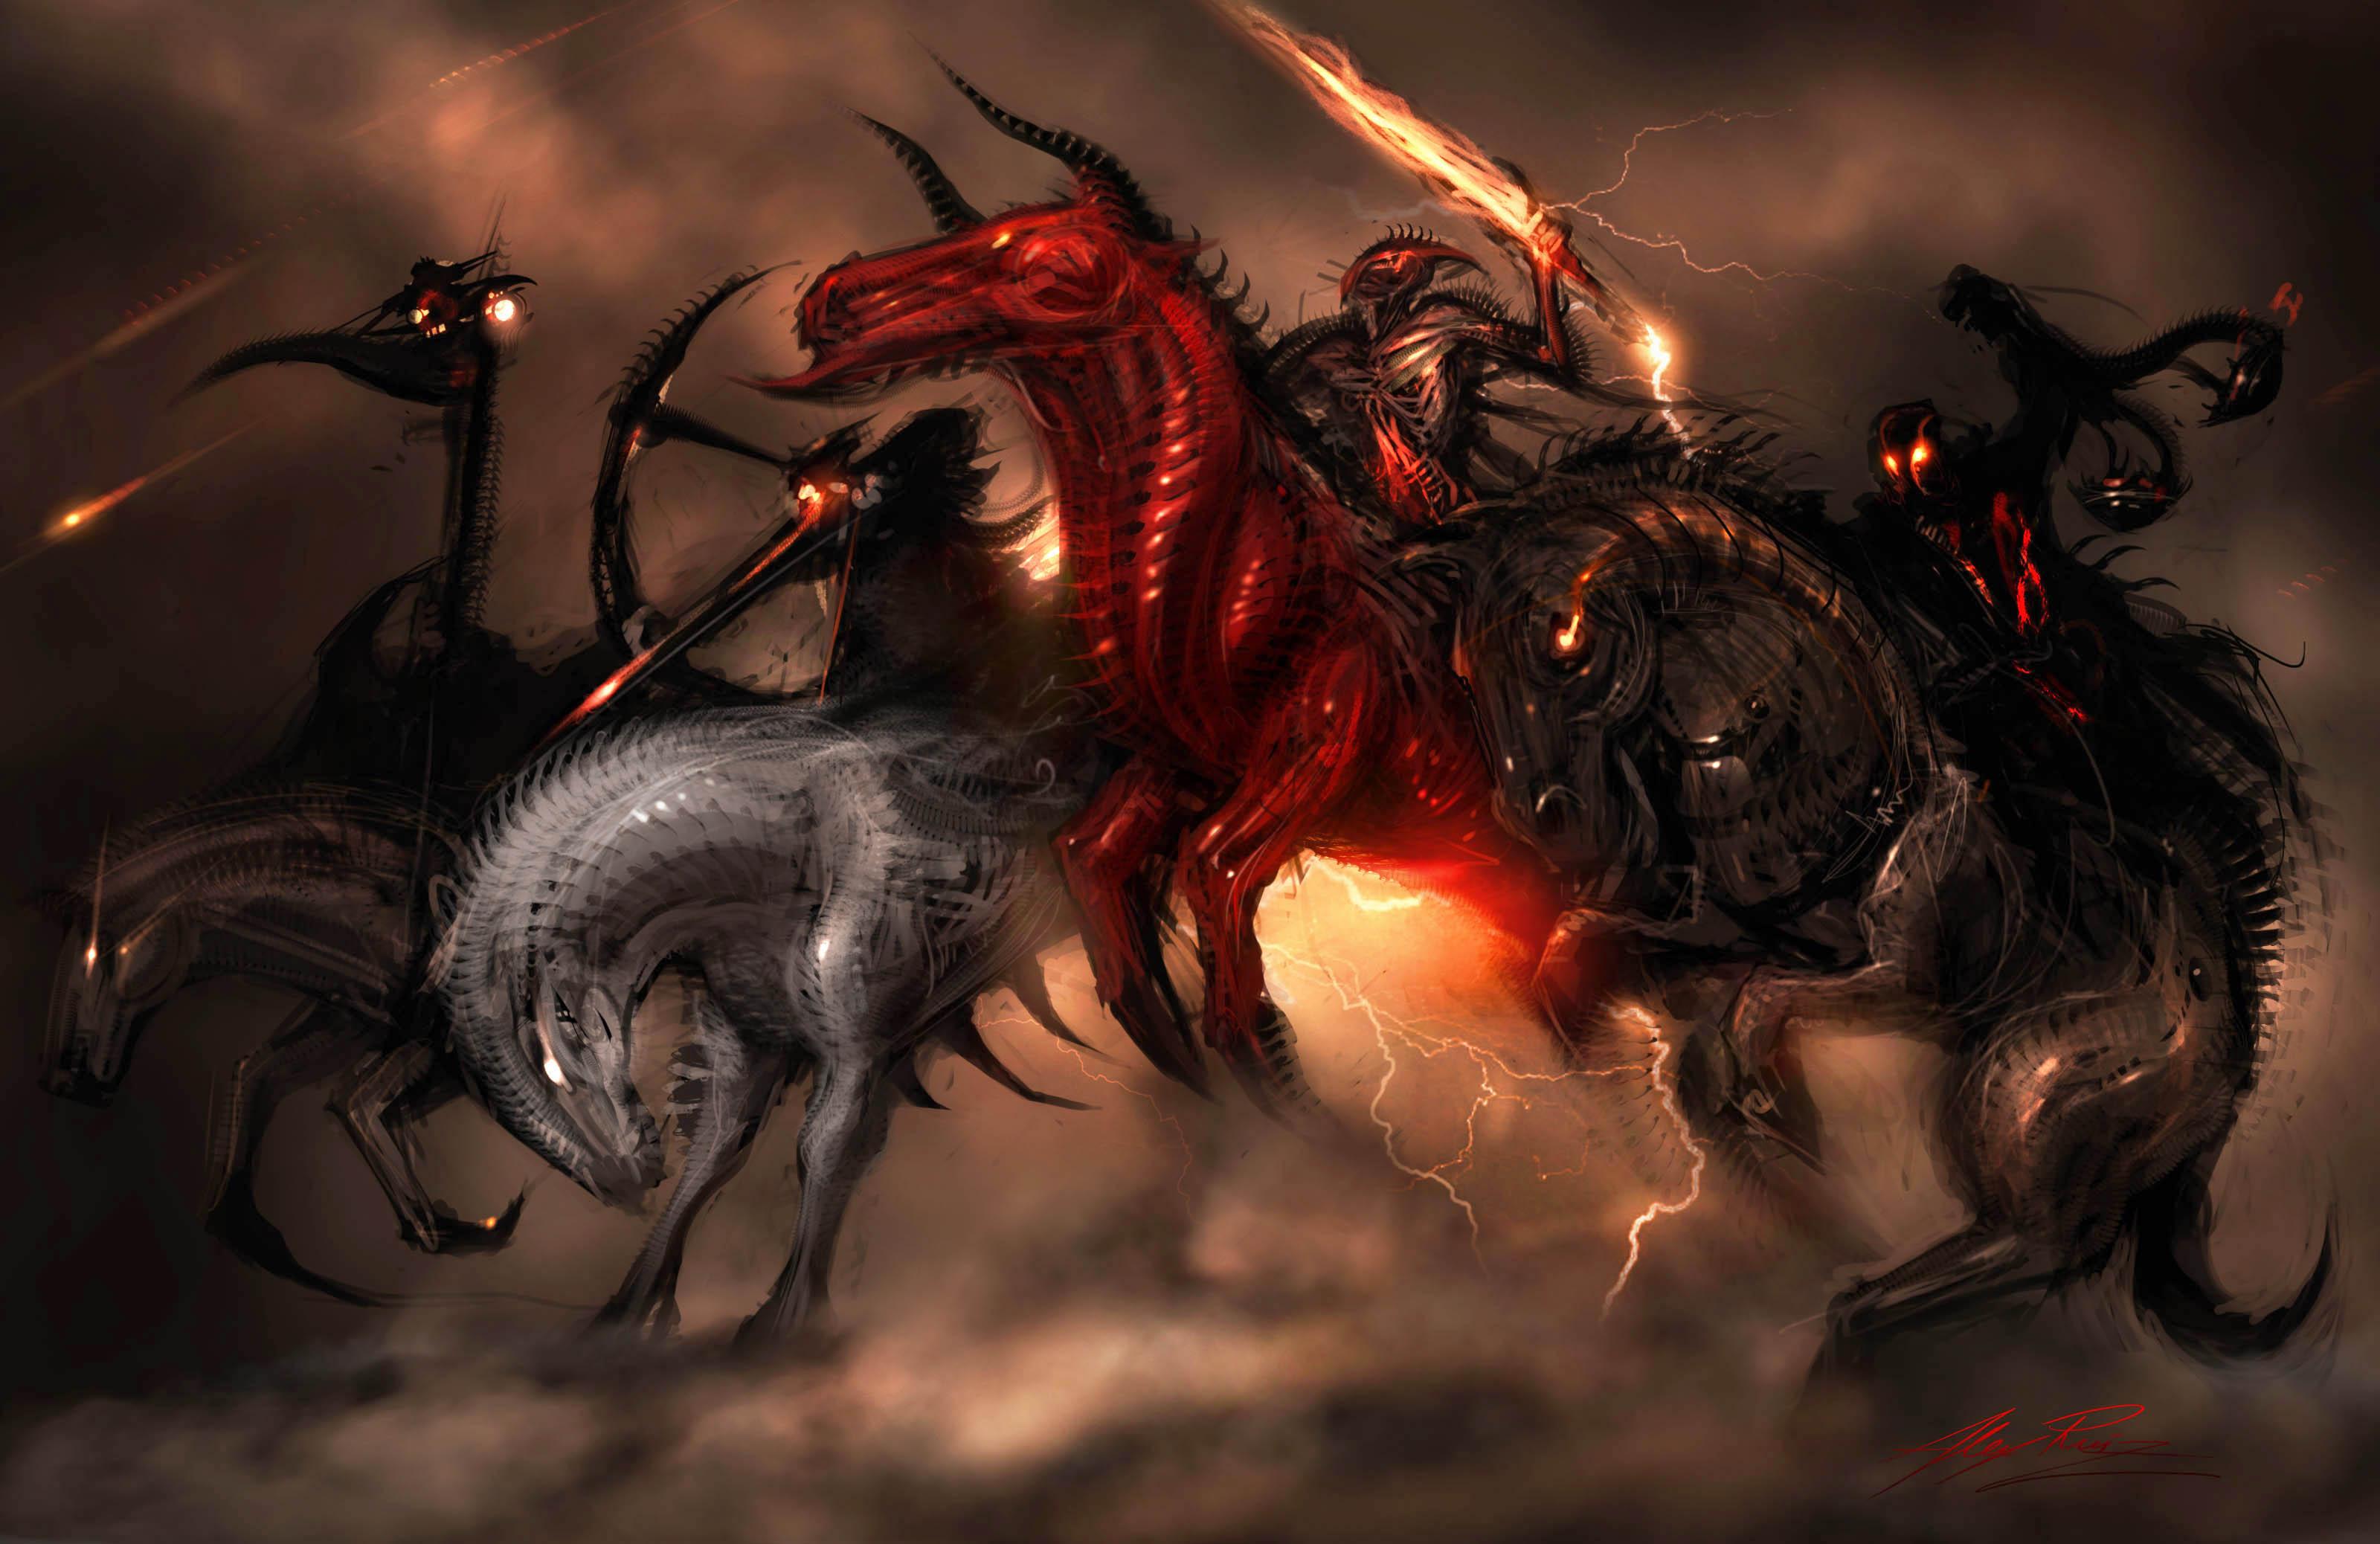 Category:Four Horsemen of the Apocalypse